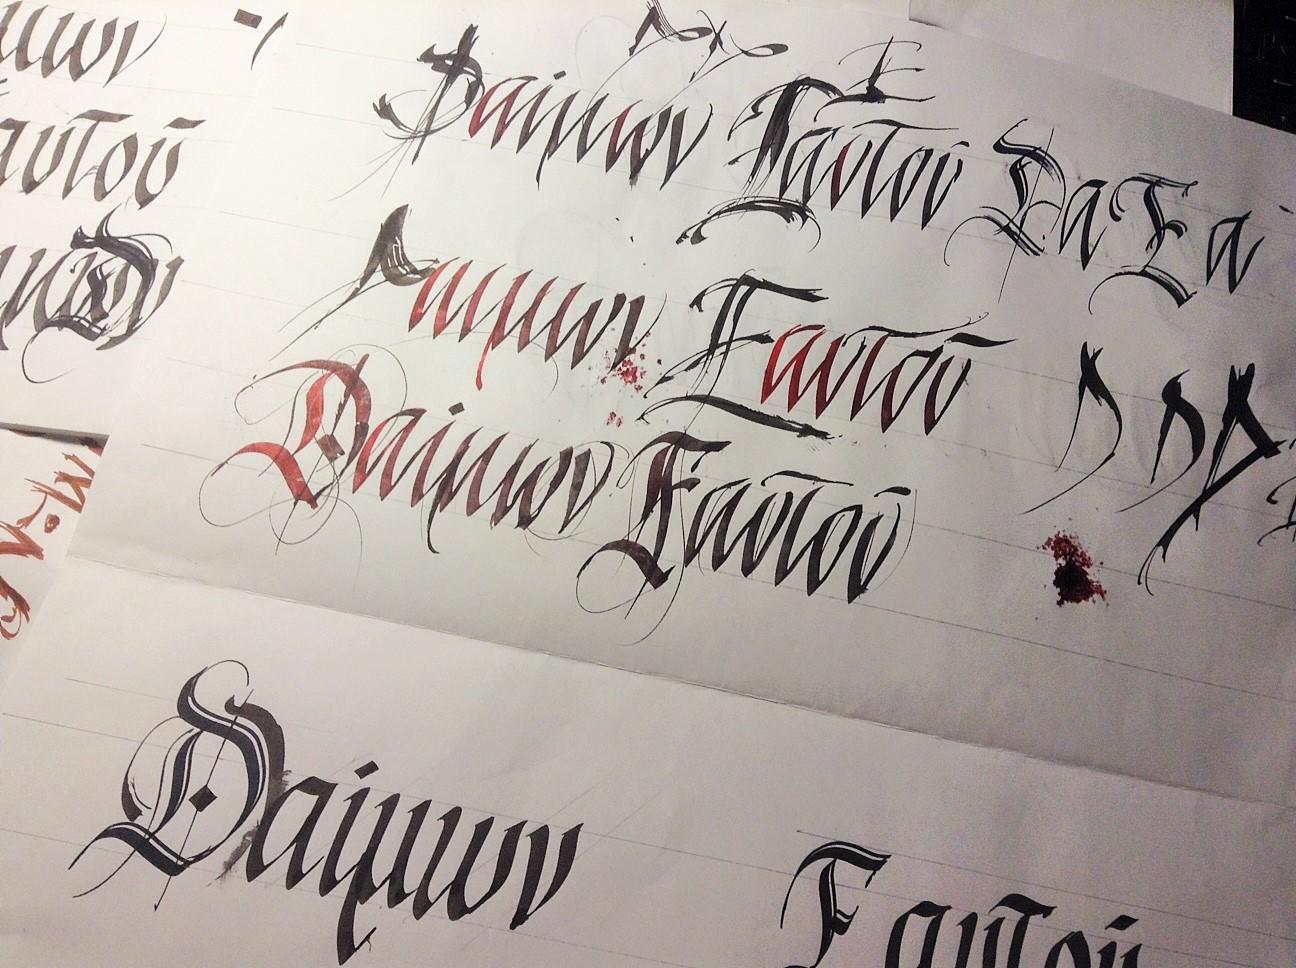 daemon13